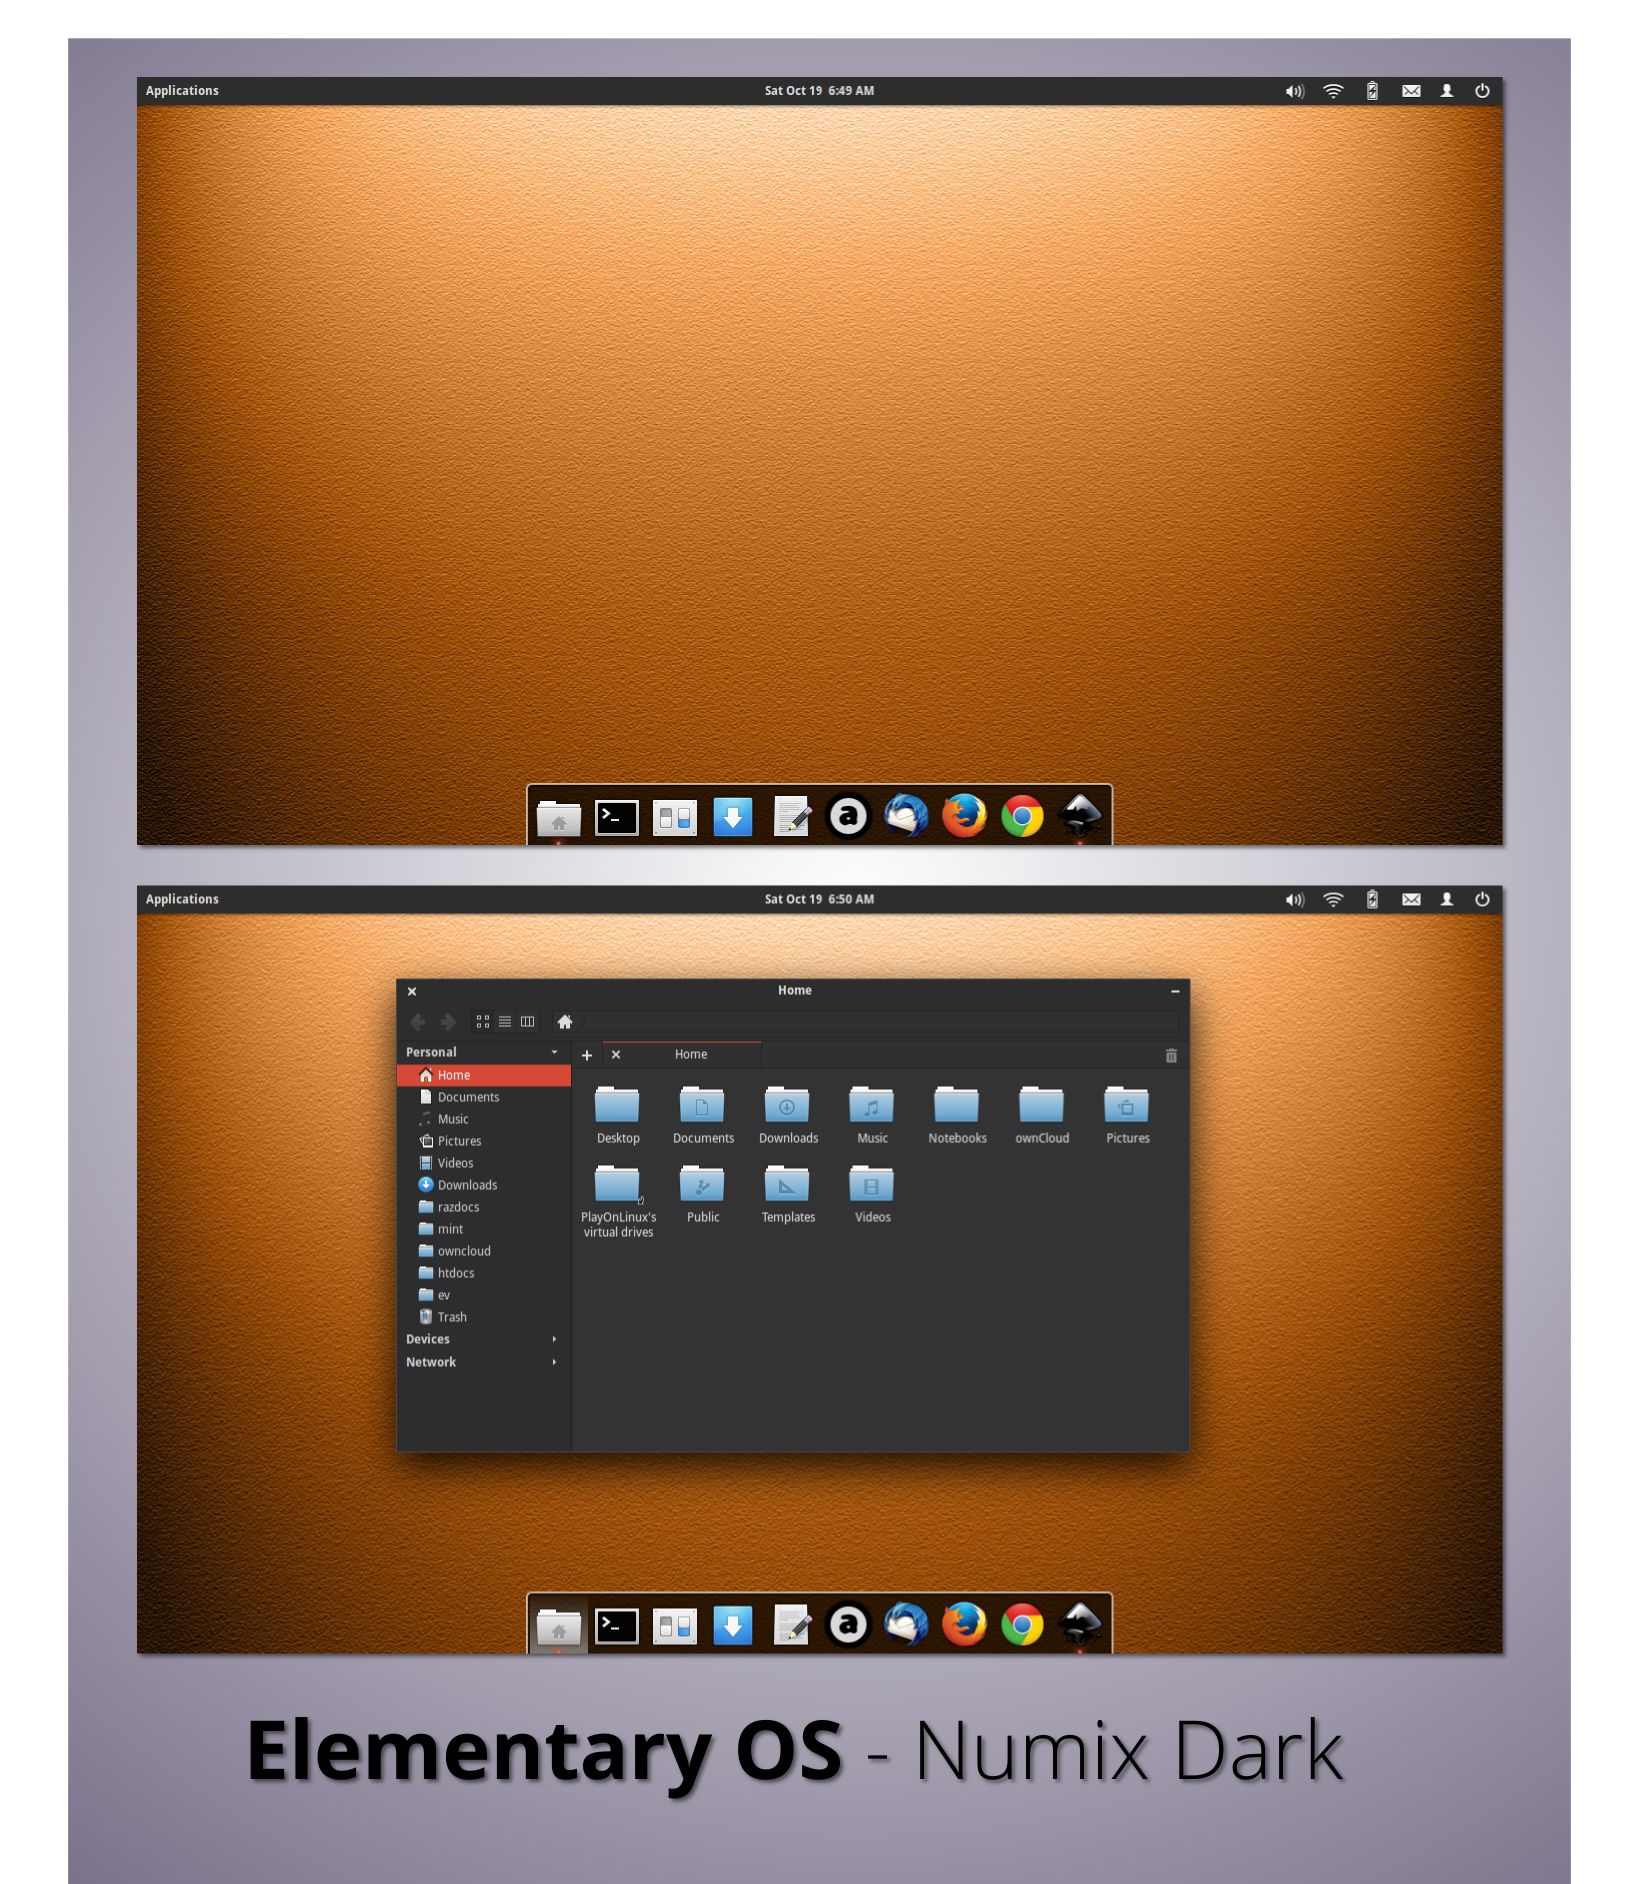 Elementary OS - Numix Dark by nekron29